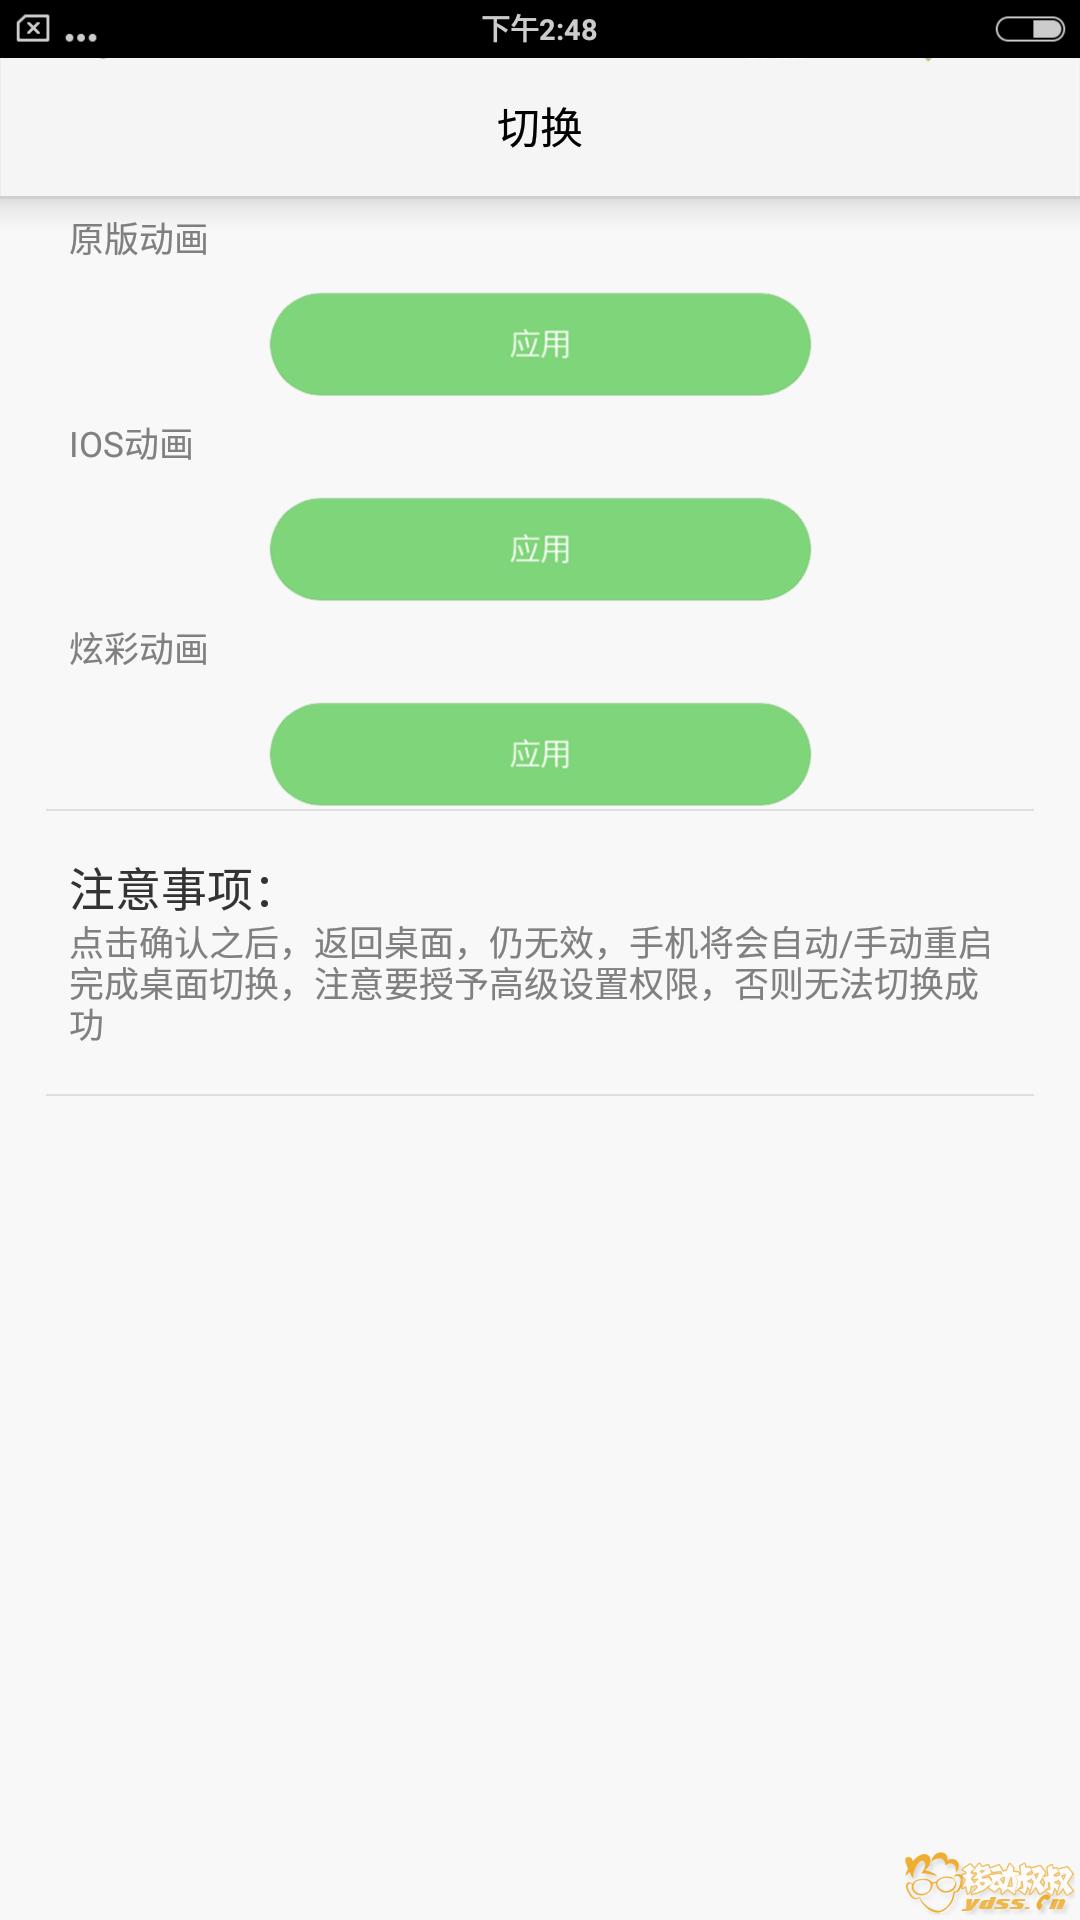 Screenshot_2017-08-19-14-48-32-649_com.zhanhong.tools.png